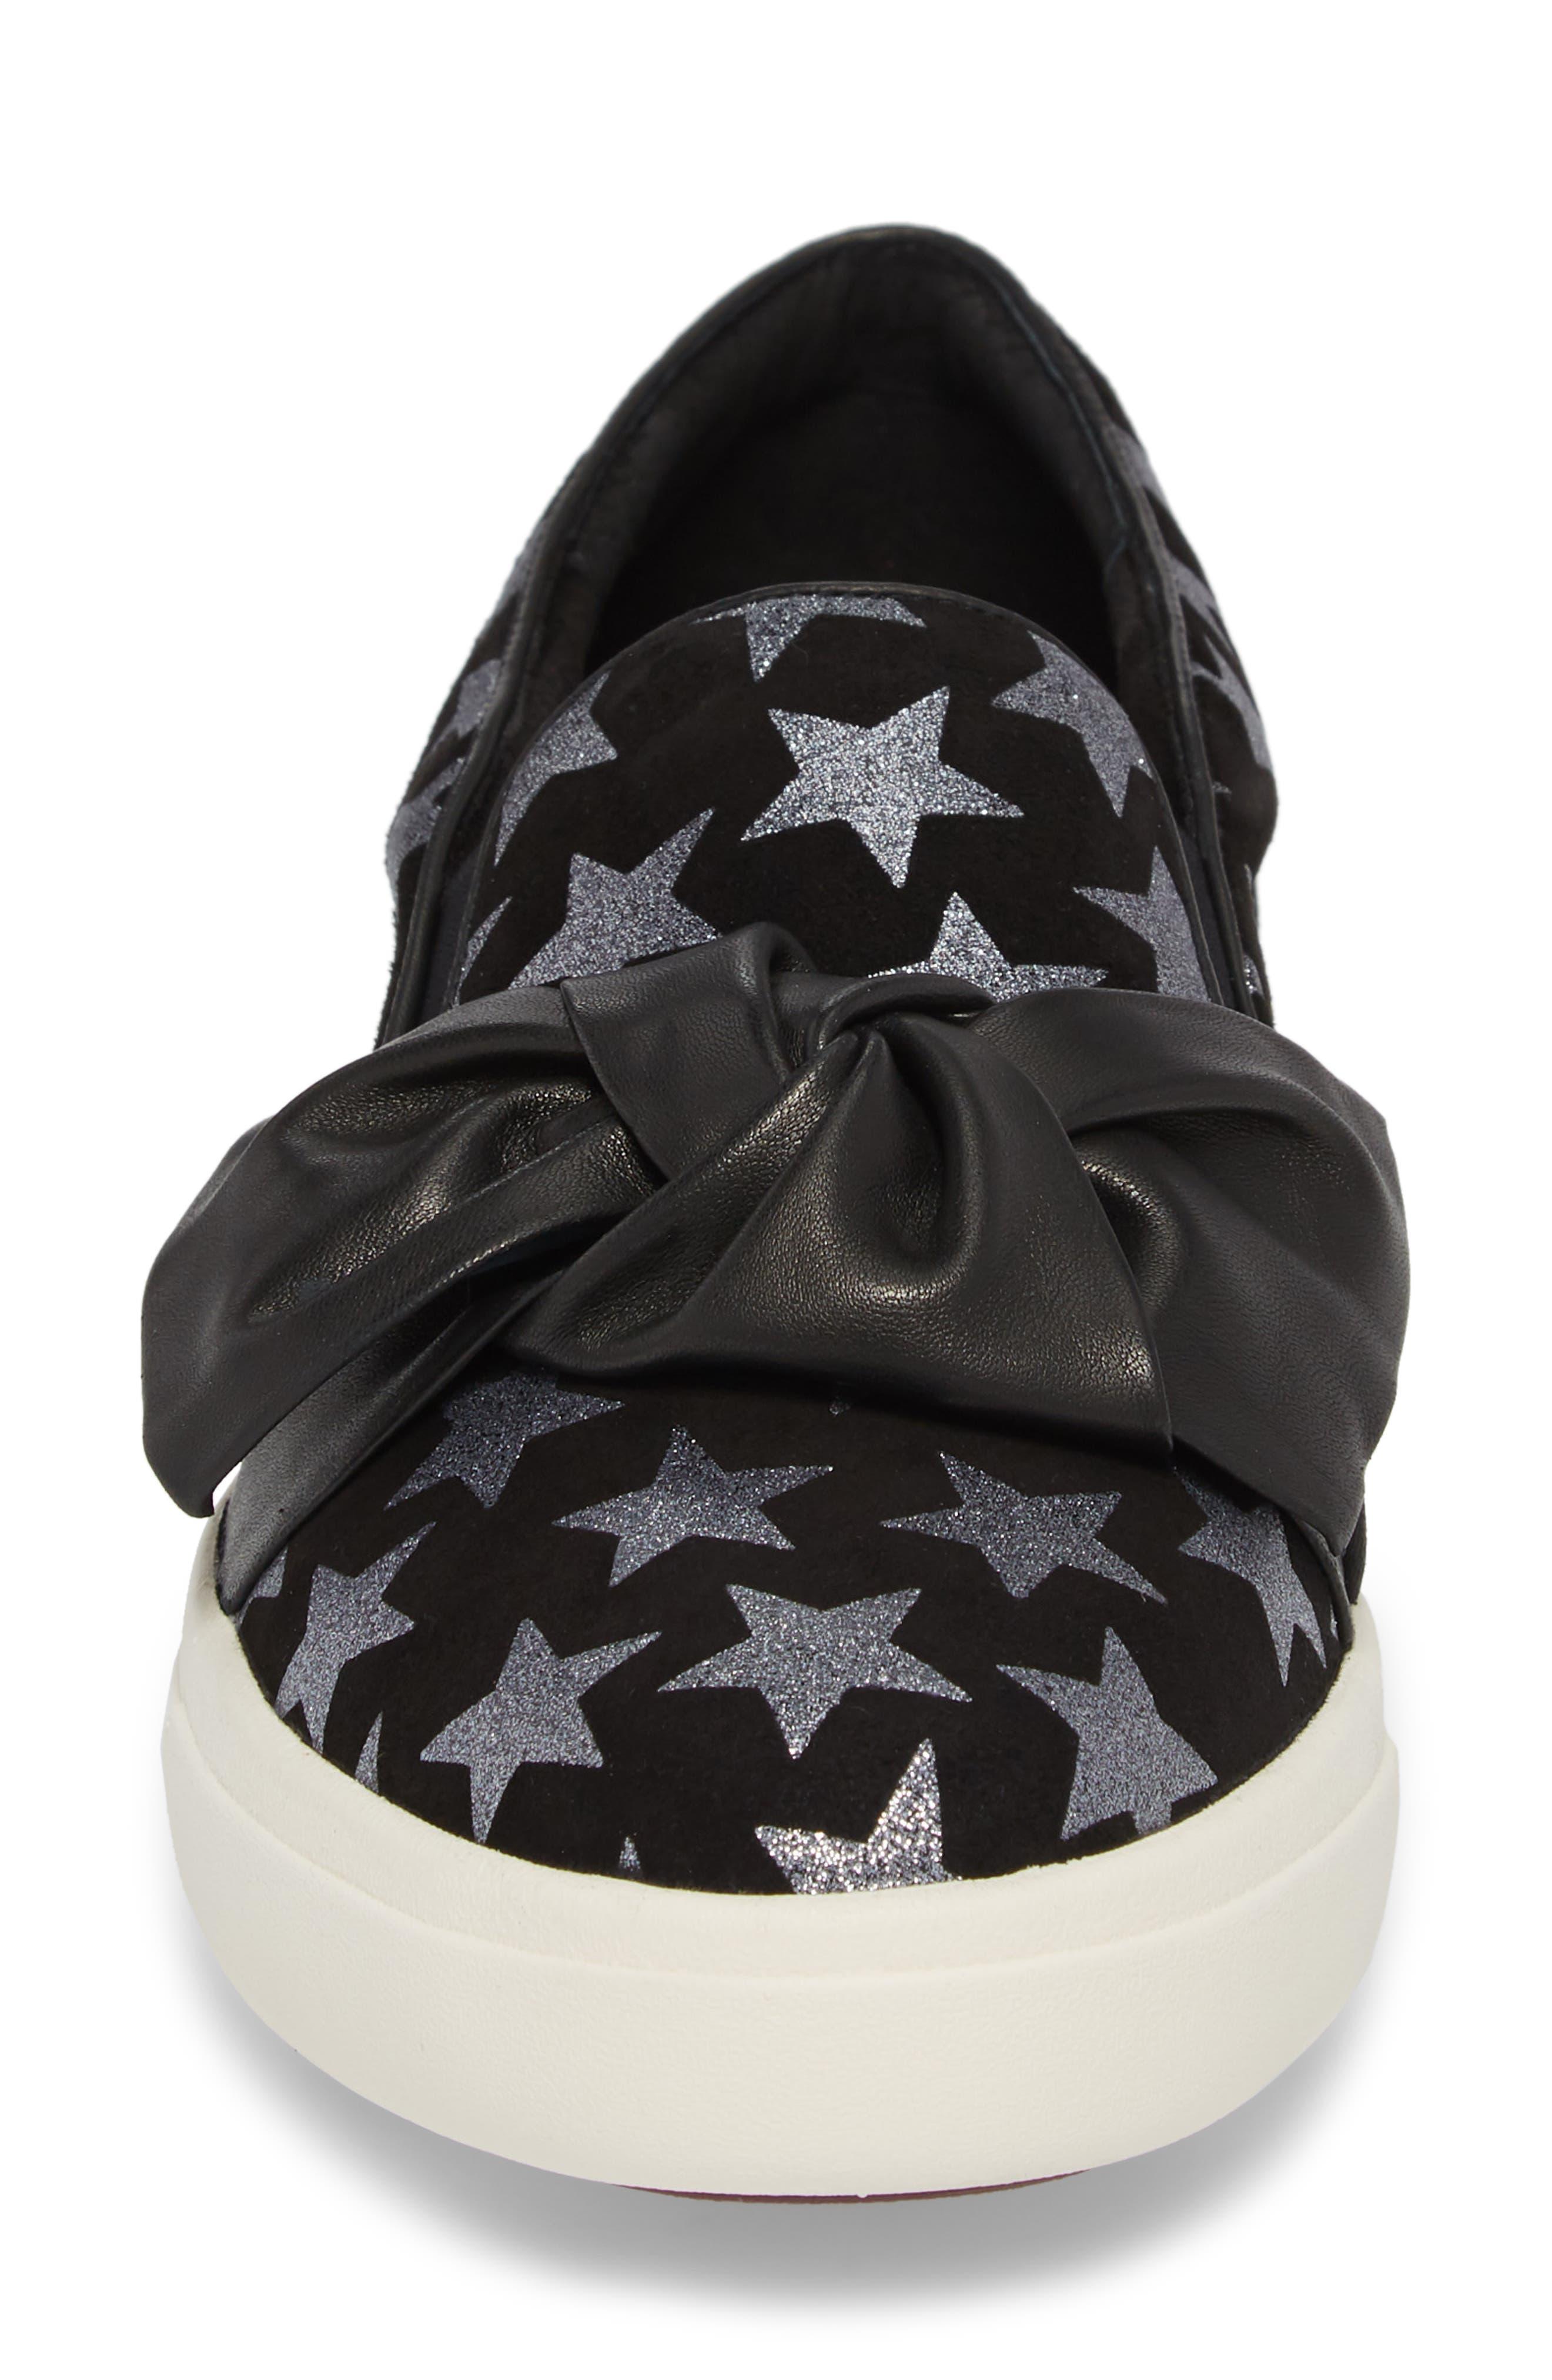 VANELI,                             Odelet Slip-On Sneaker,                             Alternate thumbnail 4, color,                             BLACK/ PEWTER SUEDE